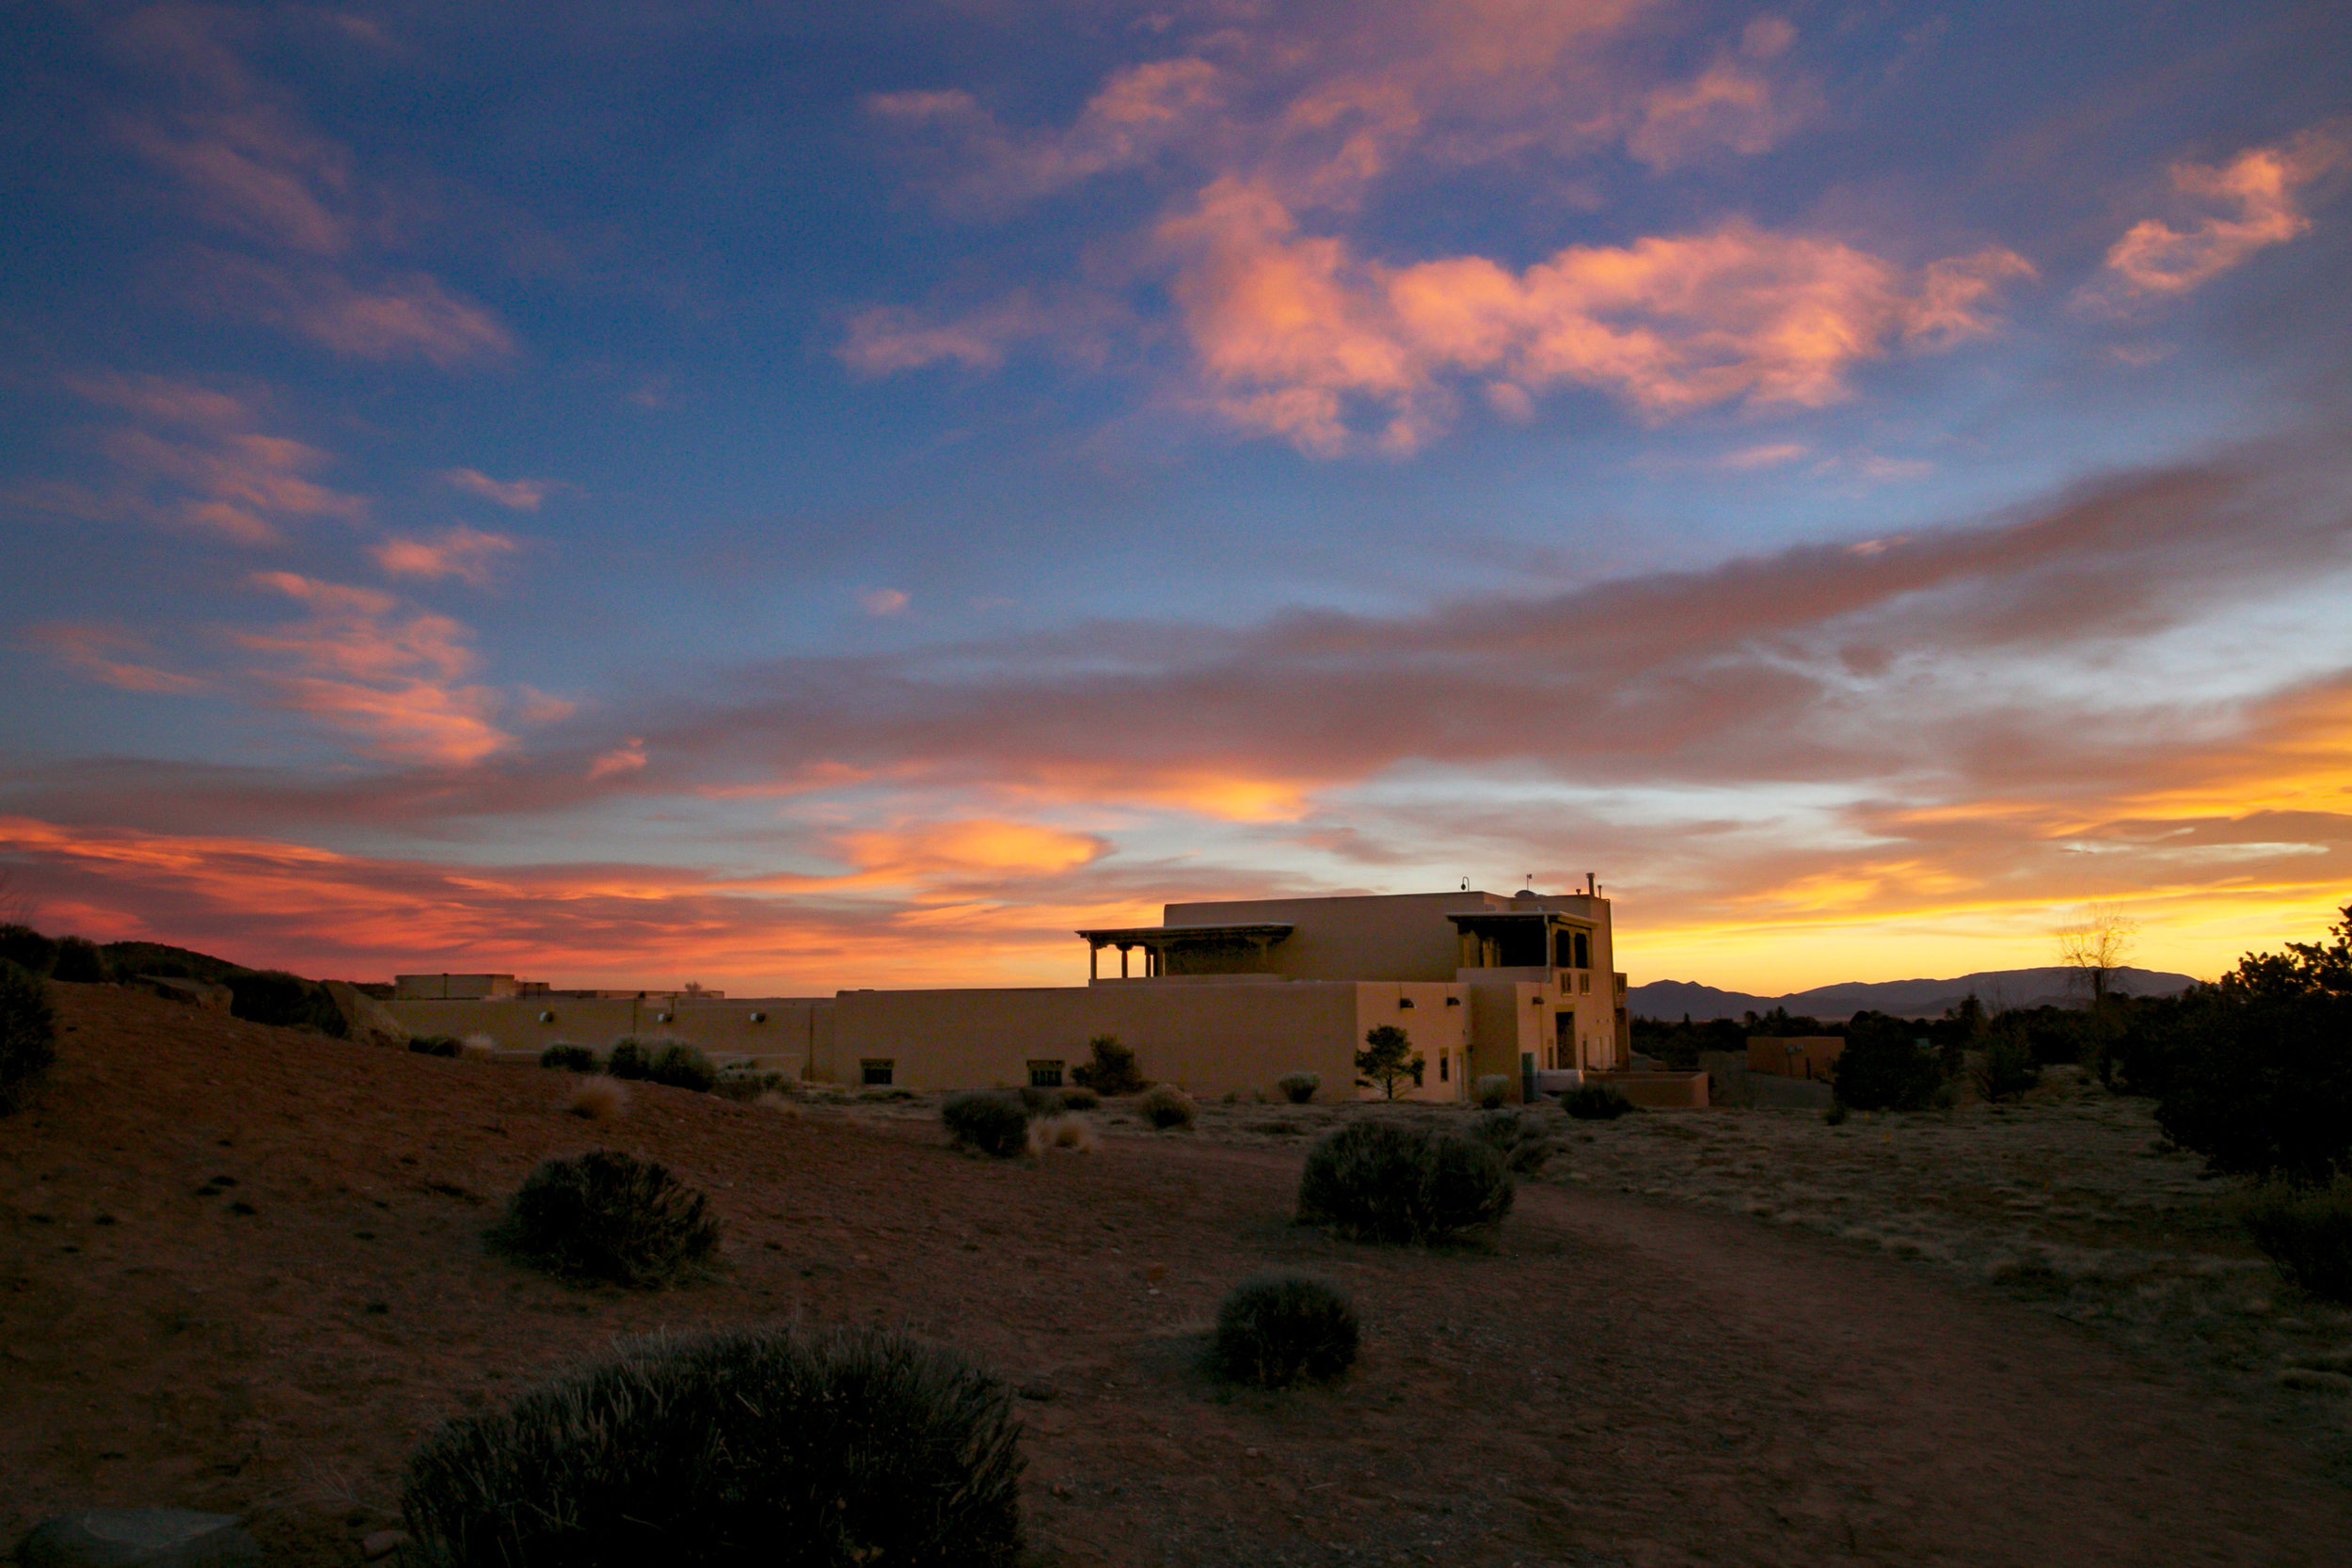 Sunset-&-Adobe-Building.jpg